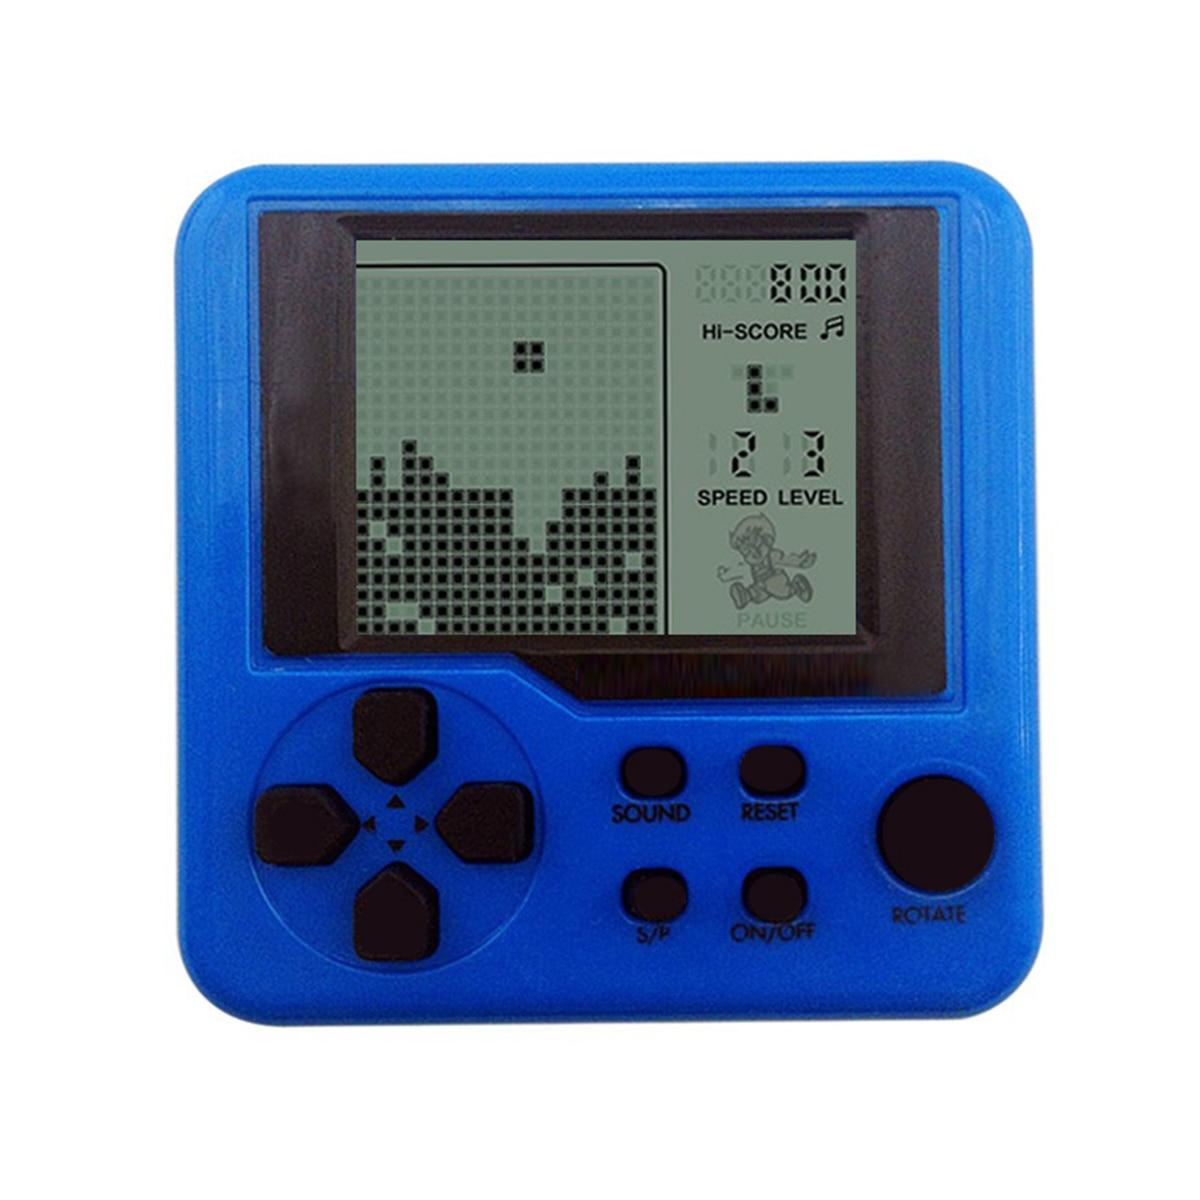 Tetris Retro Portable Handheld Game Console Puzzle Classic Kids Toy UK Special